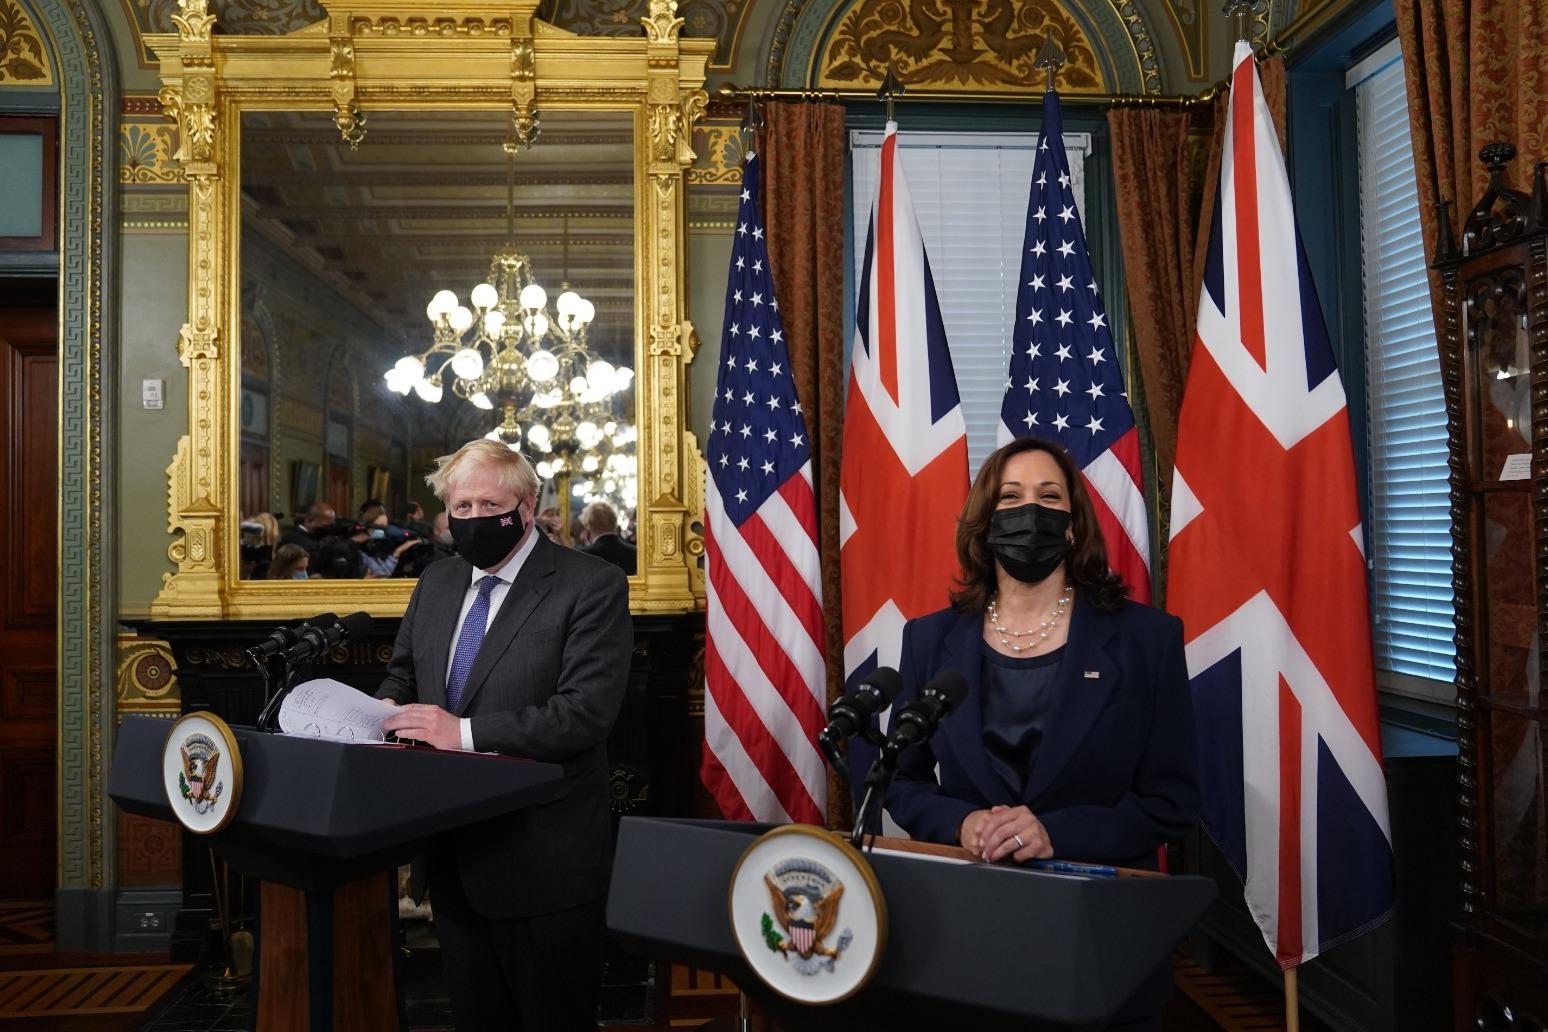 Boris Johnson arrives at White House for talks with Joe Biden